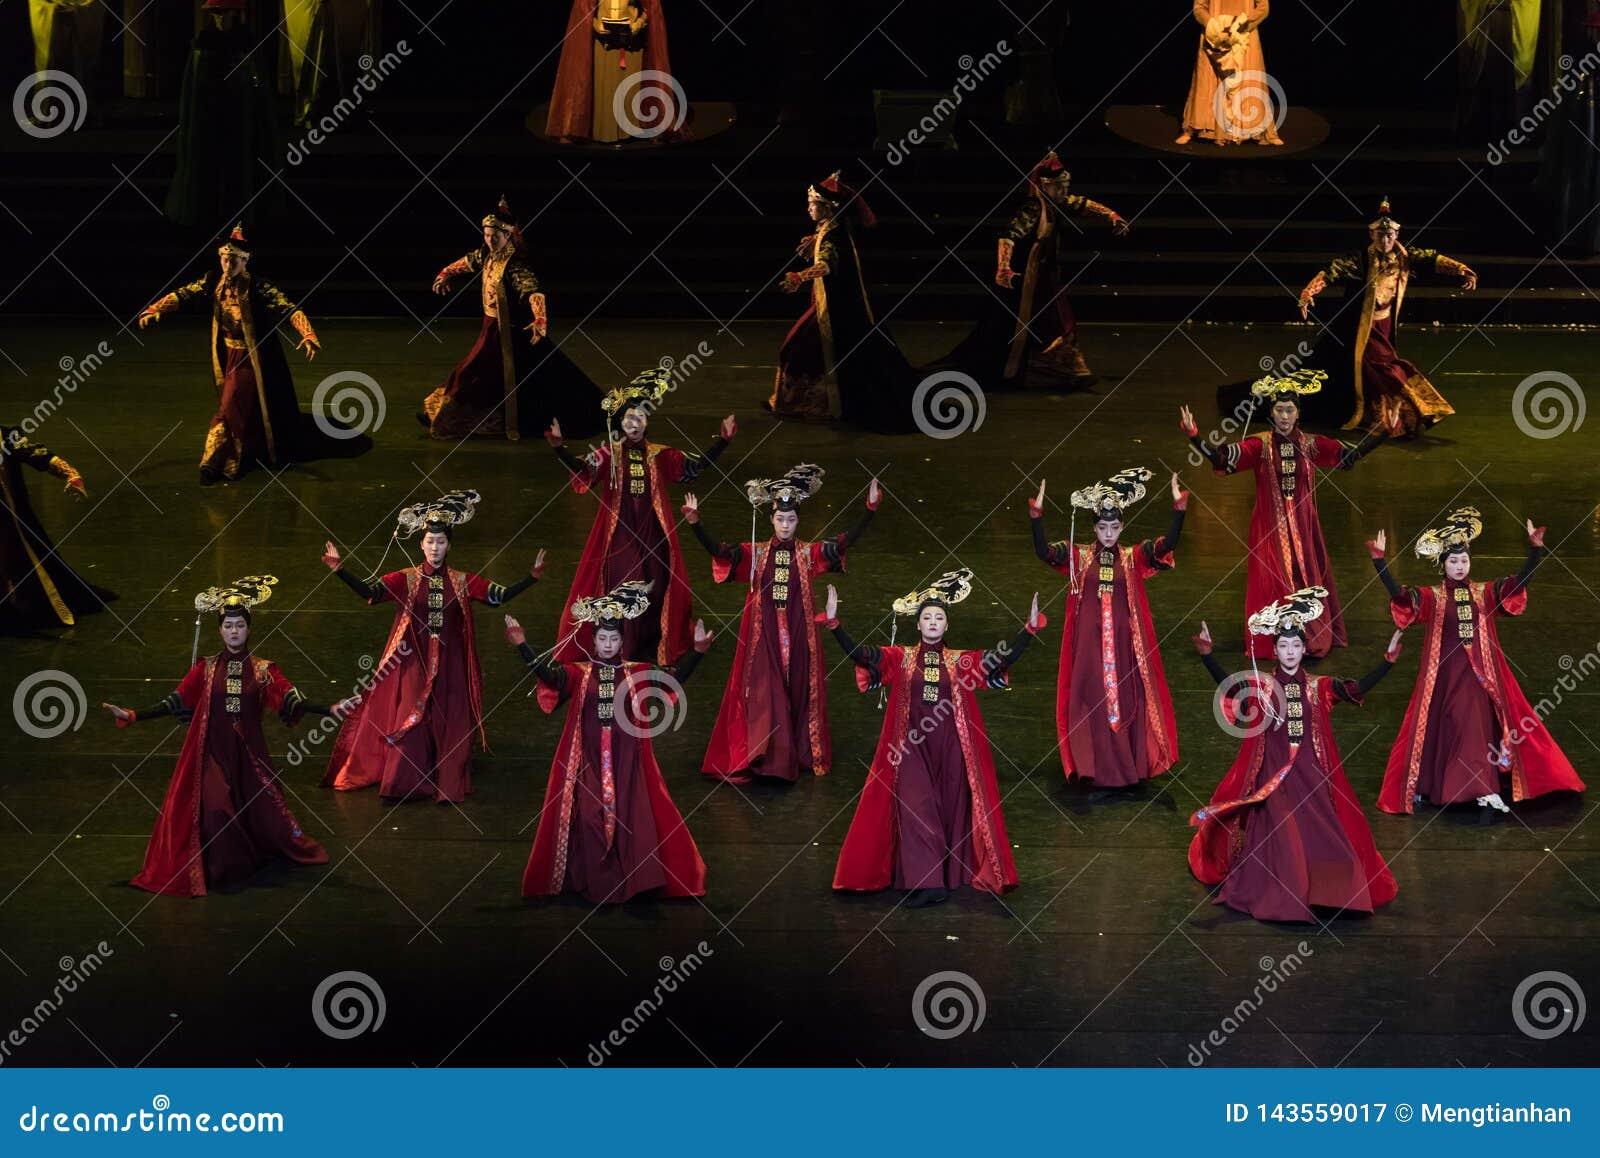 Dança de corte da princesa Gege Dance 3-Classical